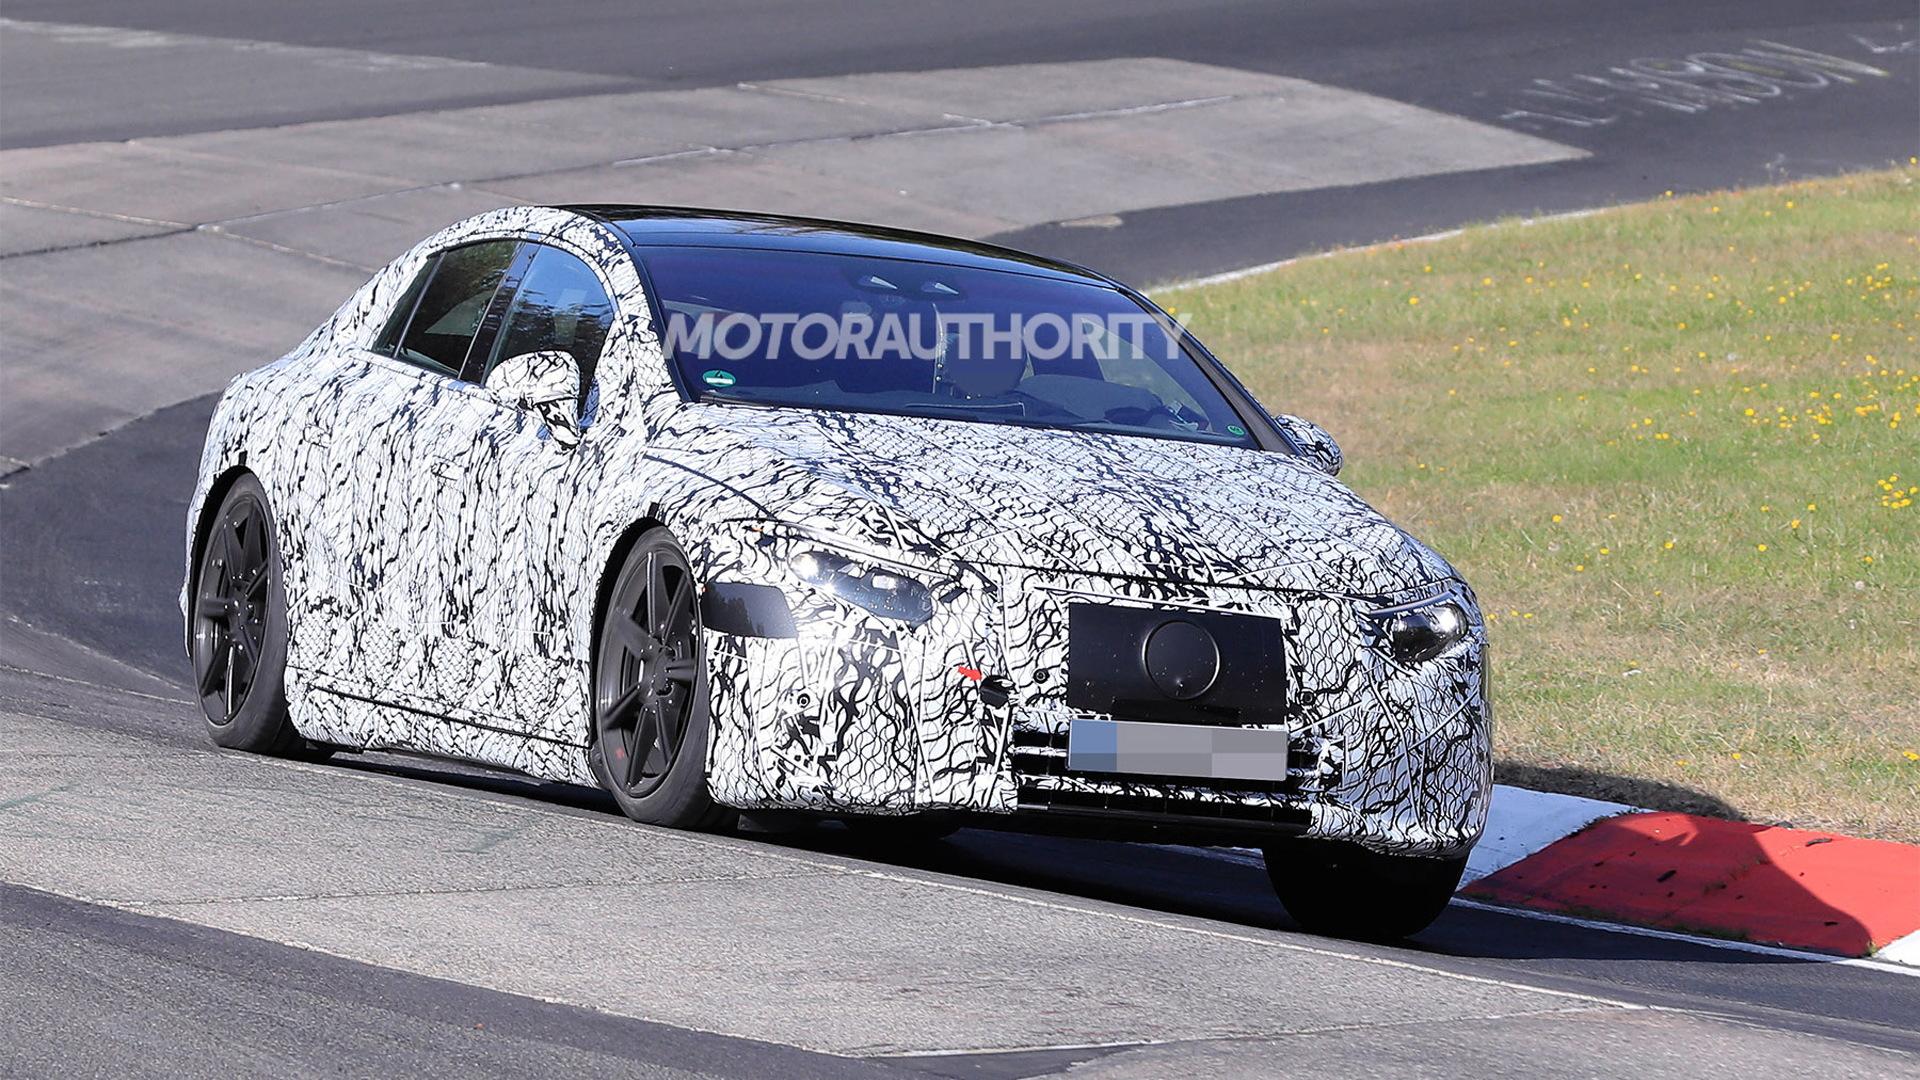 2022 Mercedes-Benz EQS spy shots - Photo credit: S. Baldauf/SB-Medien